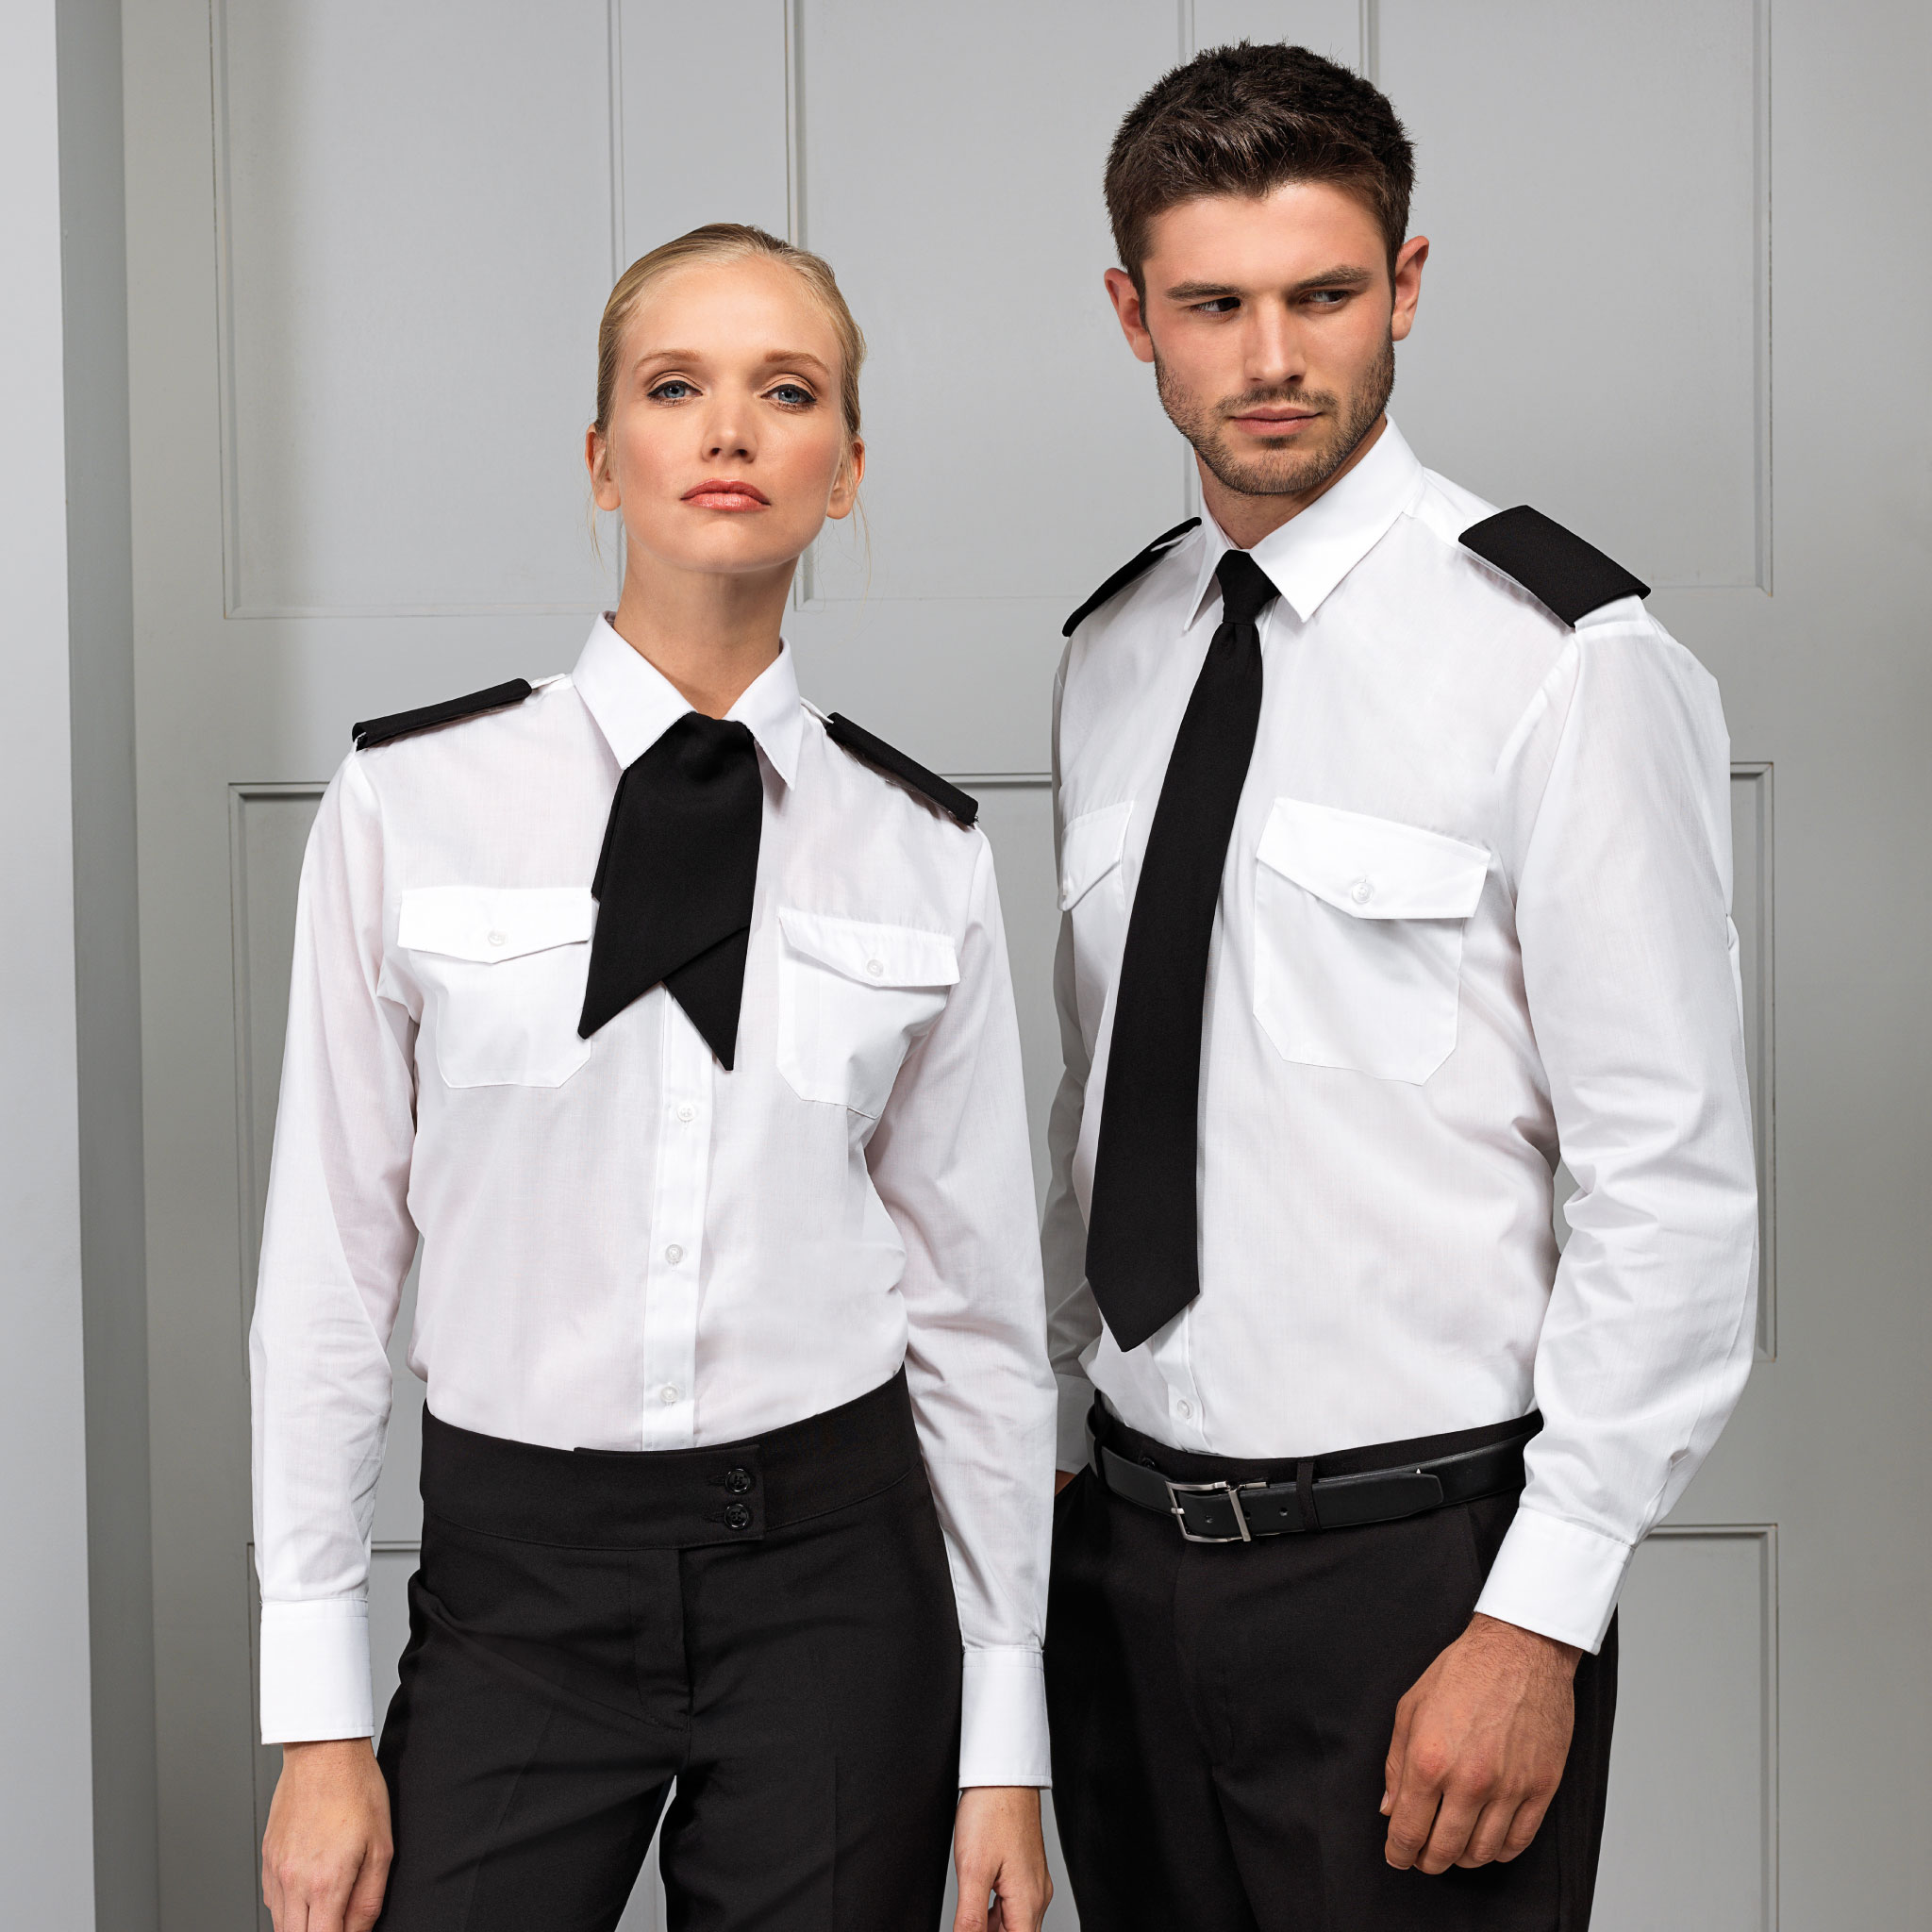 Security Uniform Workwear